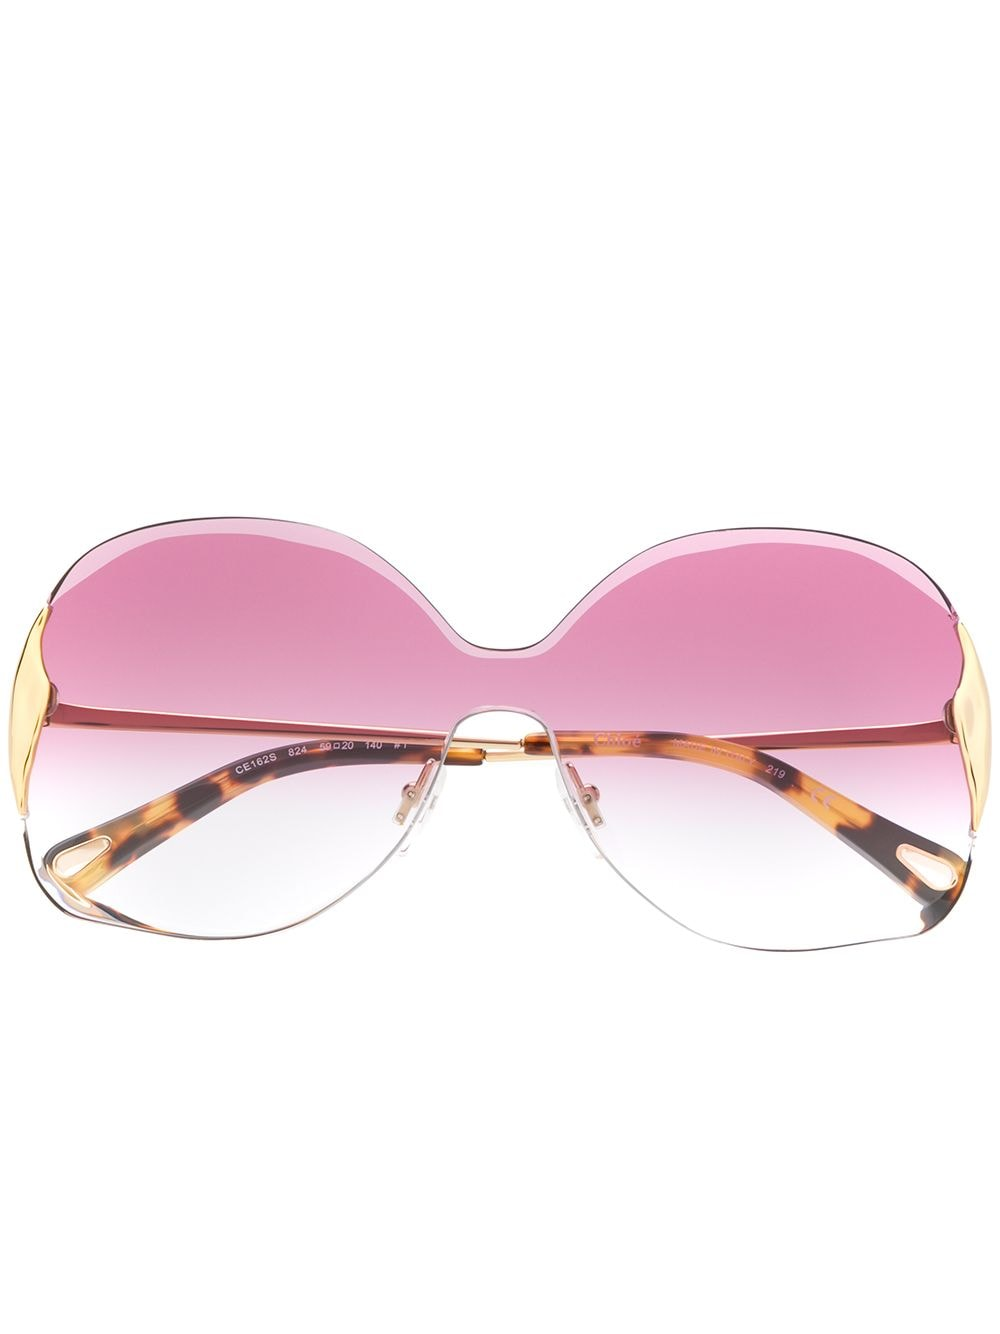 Chloé Eyewear 'Curtis' Sonnenbrille - Gold